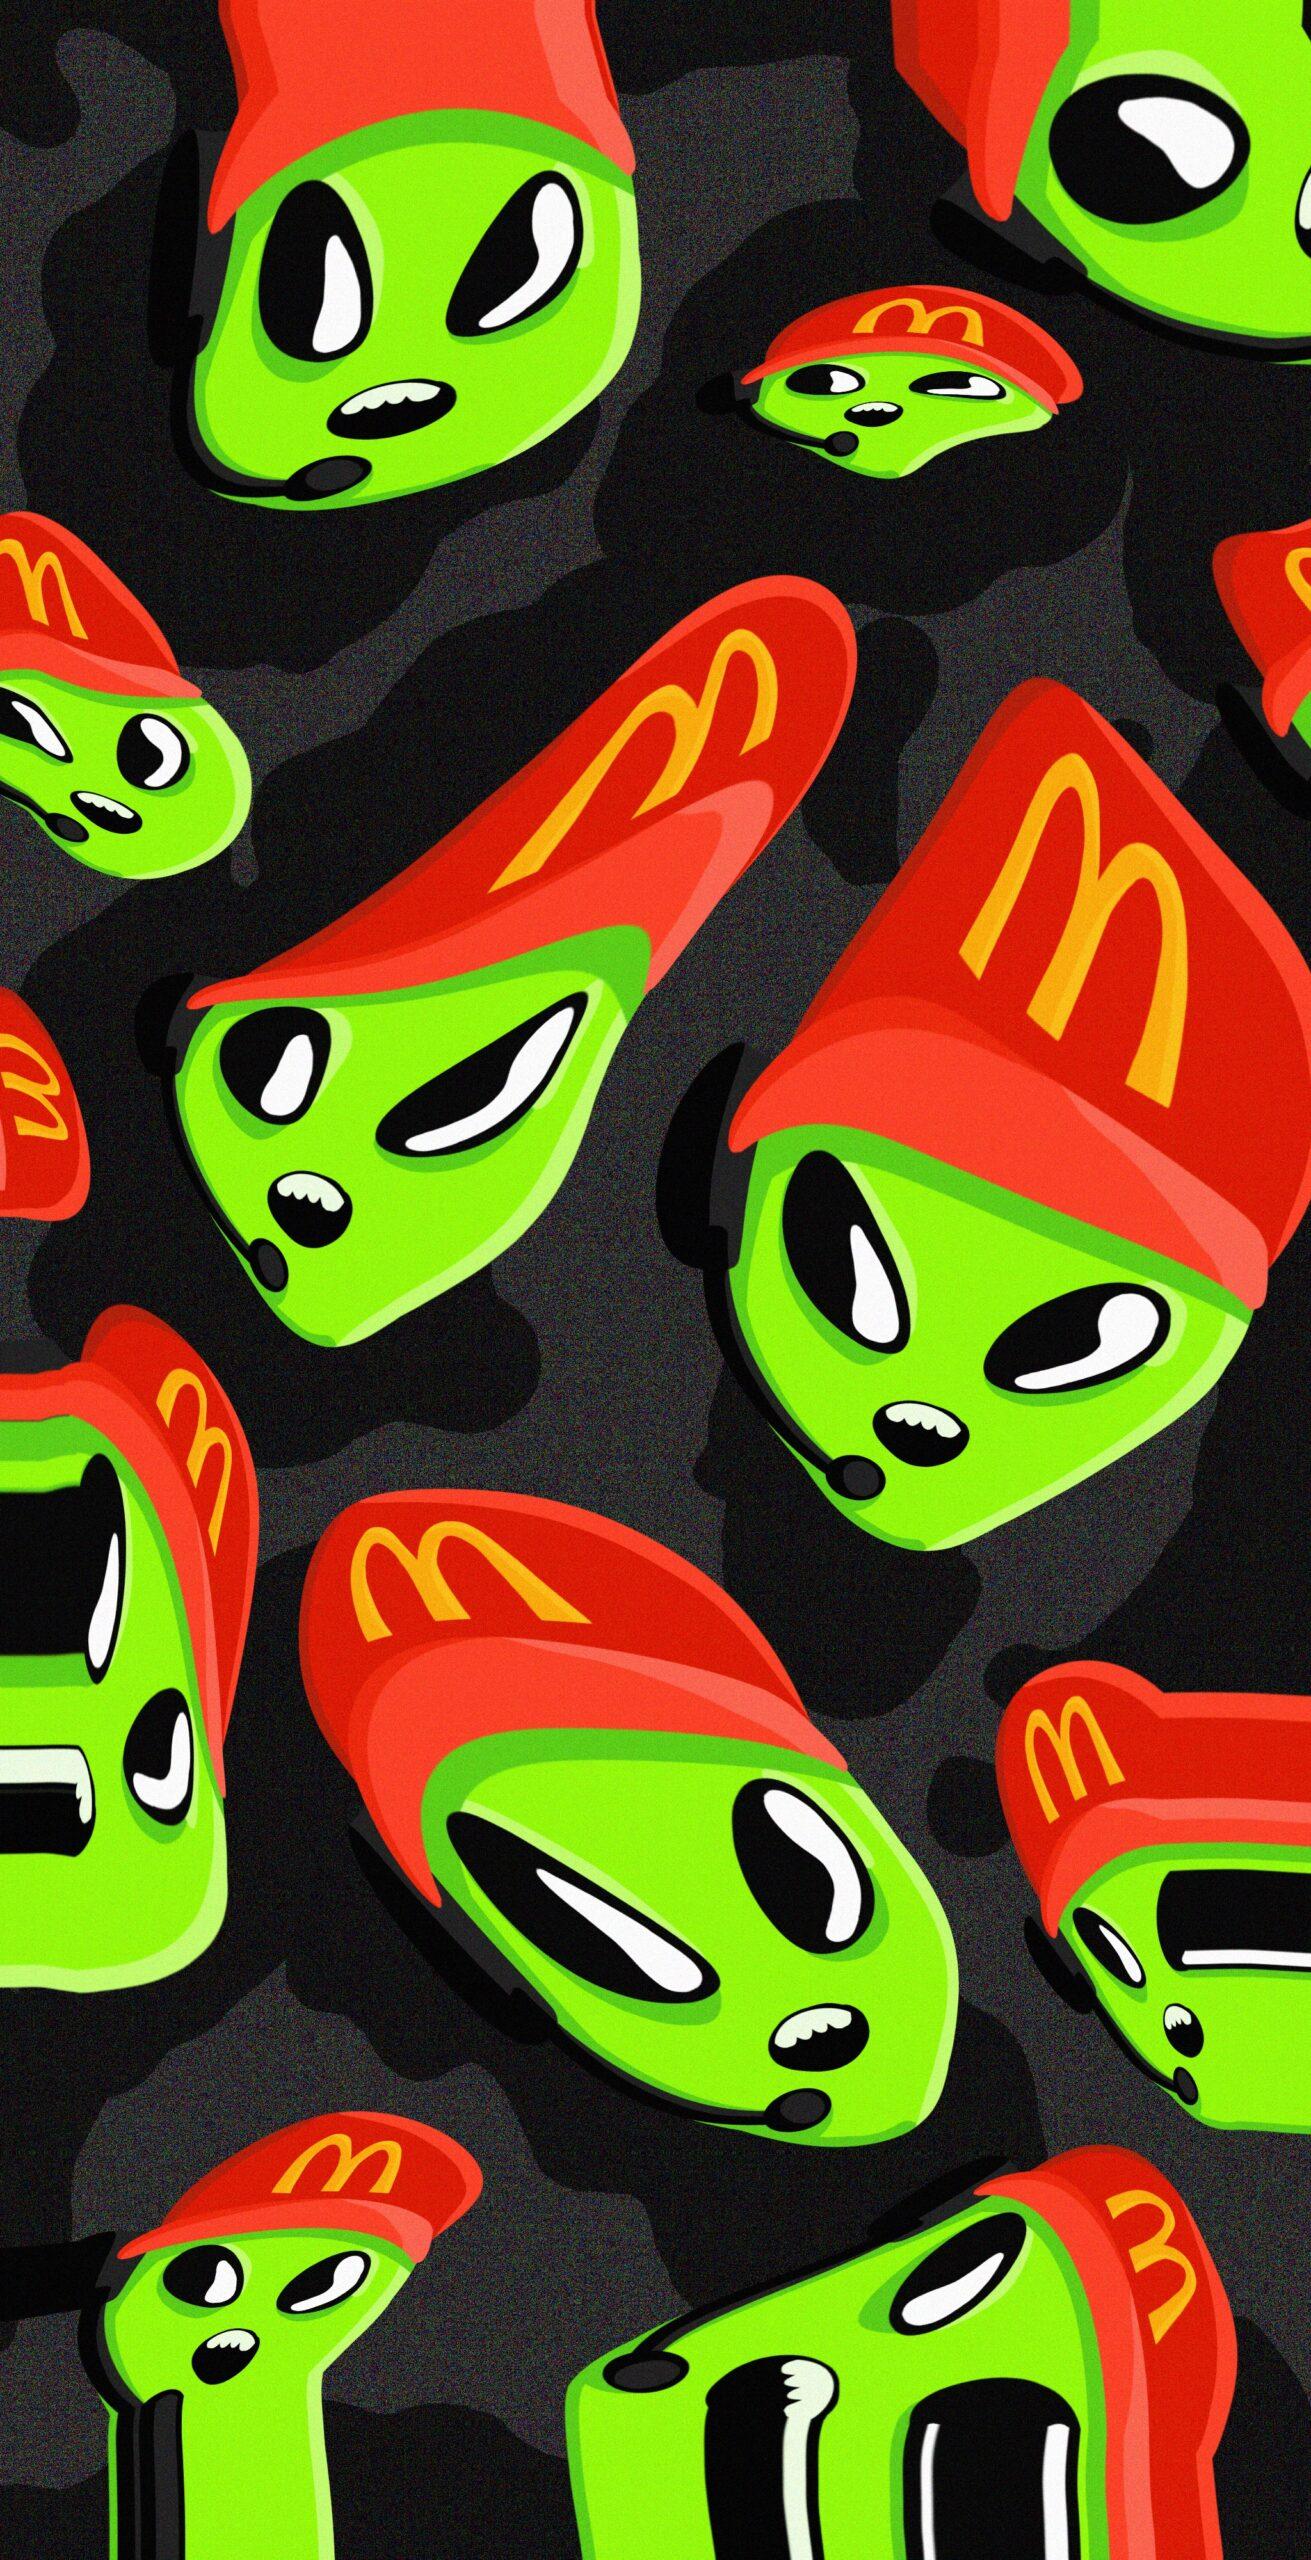 space green alien mcdonalds employee wallpaper